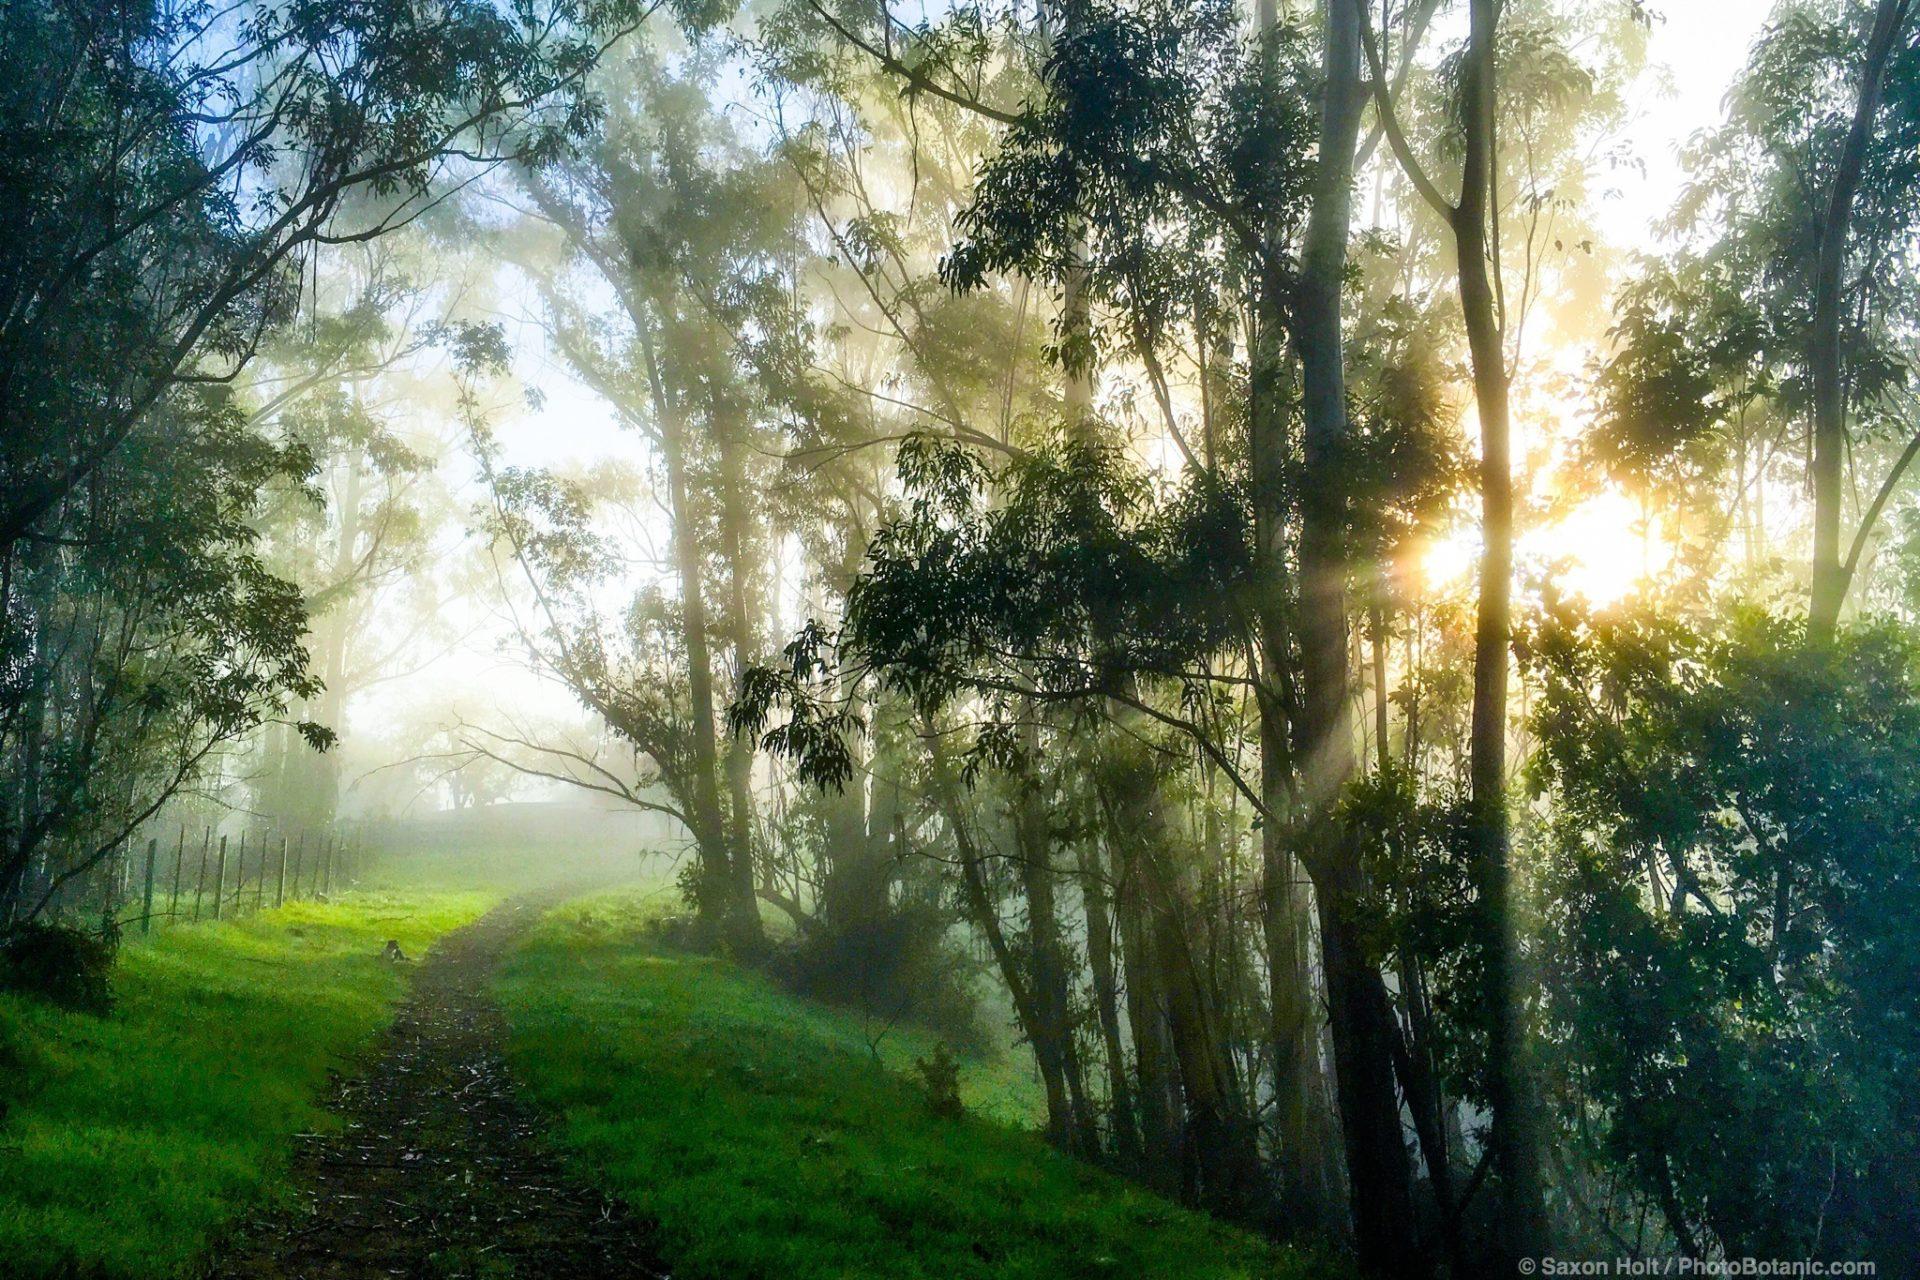 Morning light - fog breaking in the winter green hills California. Cherry Hill. 02/29/2016 07:58:28